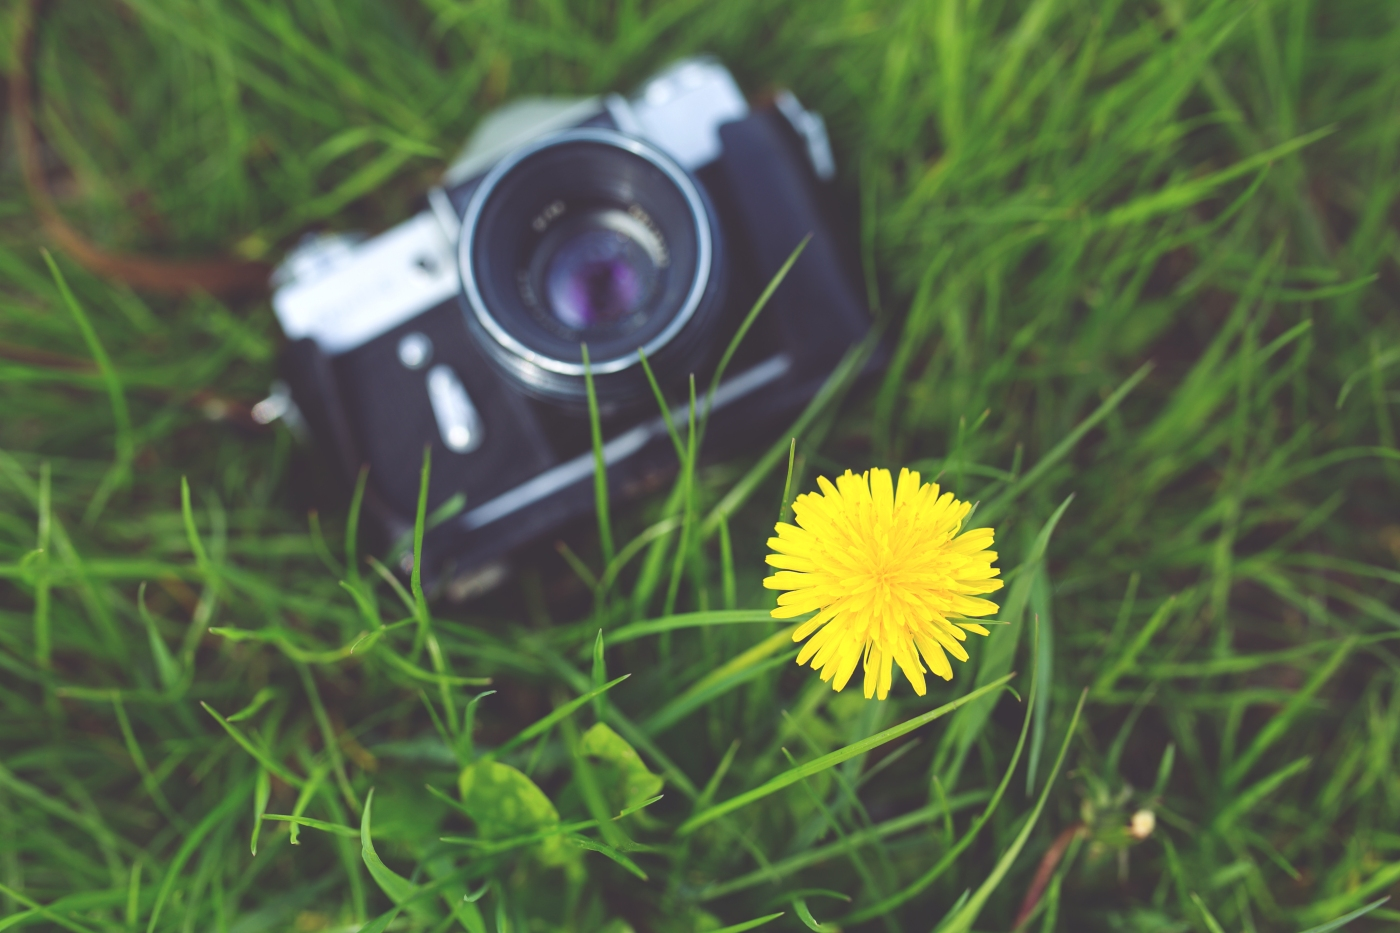 Camera on grass